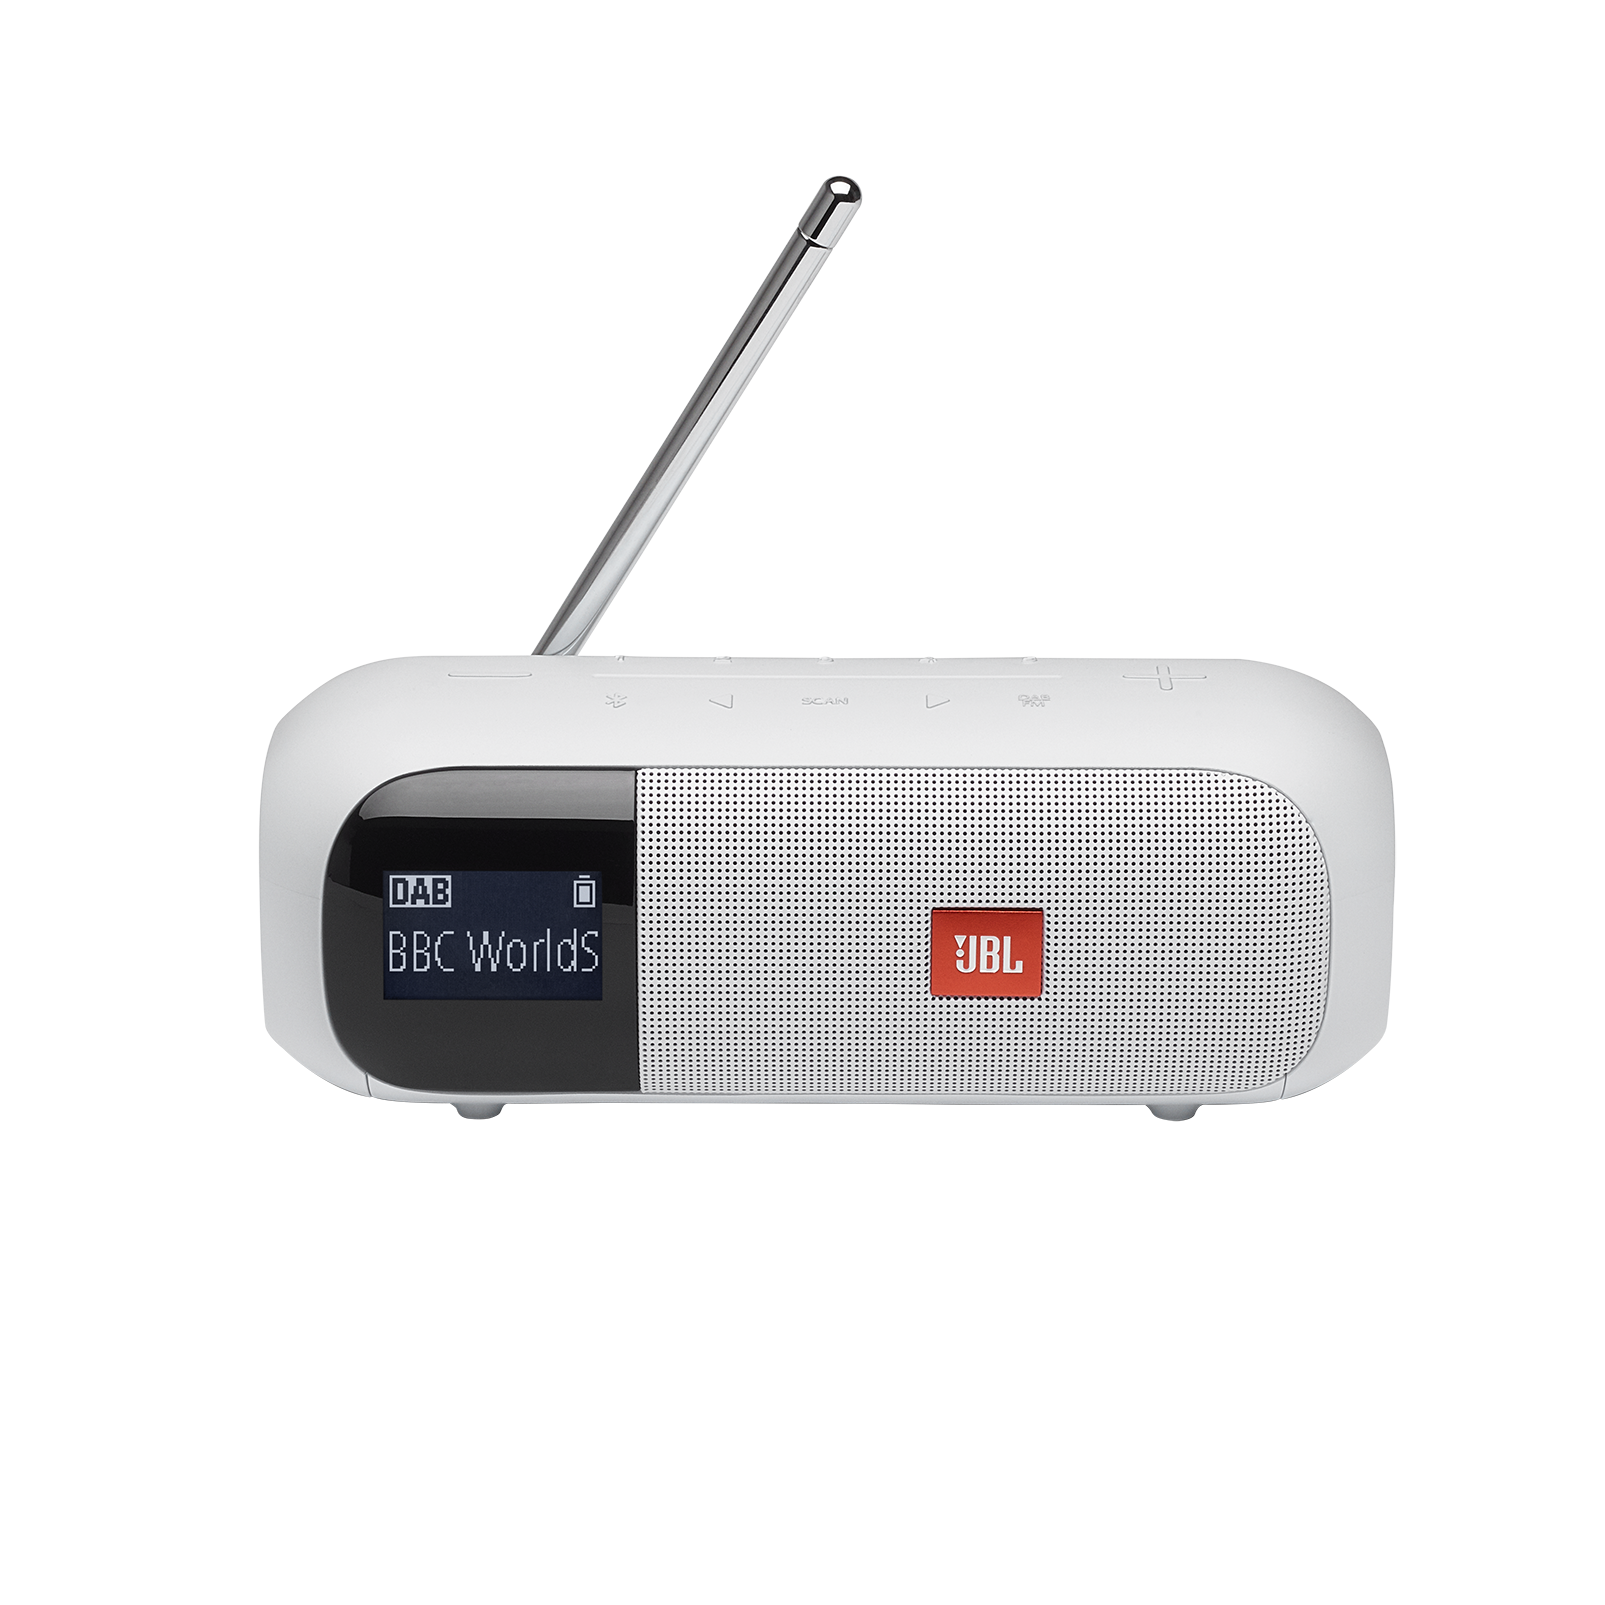 JBL Tuner 2 - White - Portable DAB/DAB+/FM radio with Bluetooth - Front